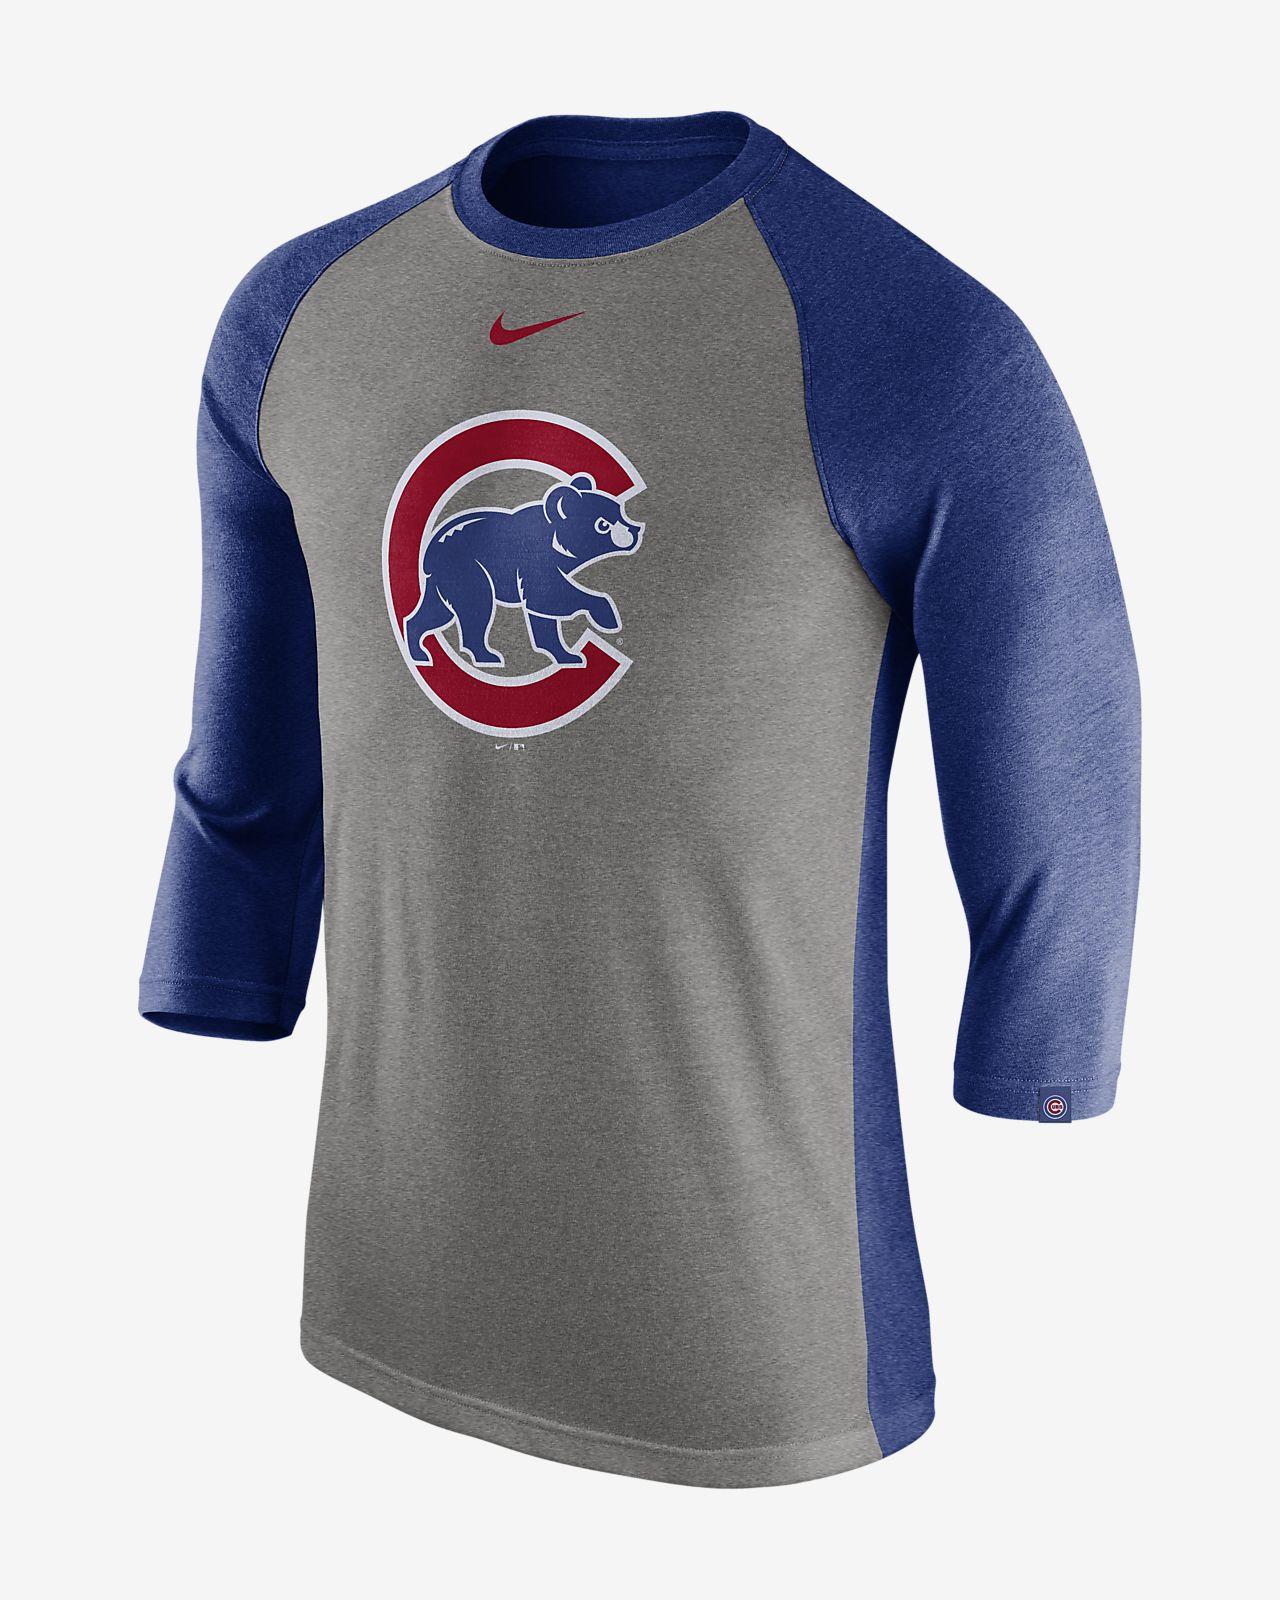 Nike Tri Raglan (MLB Cubs) Men's 3/4 Sleeve Top